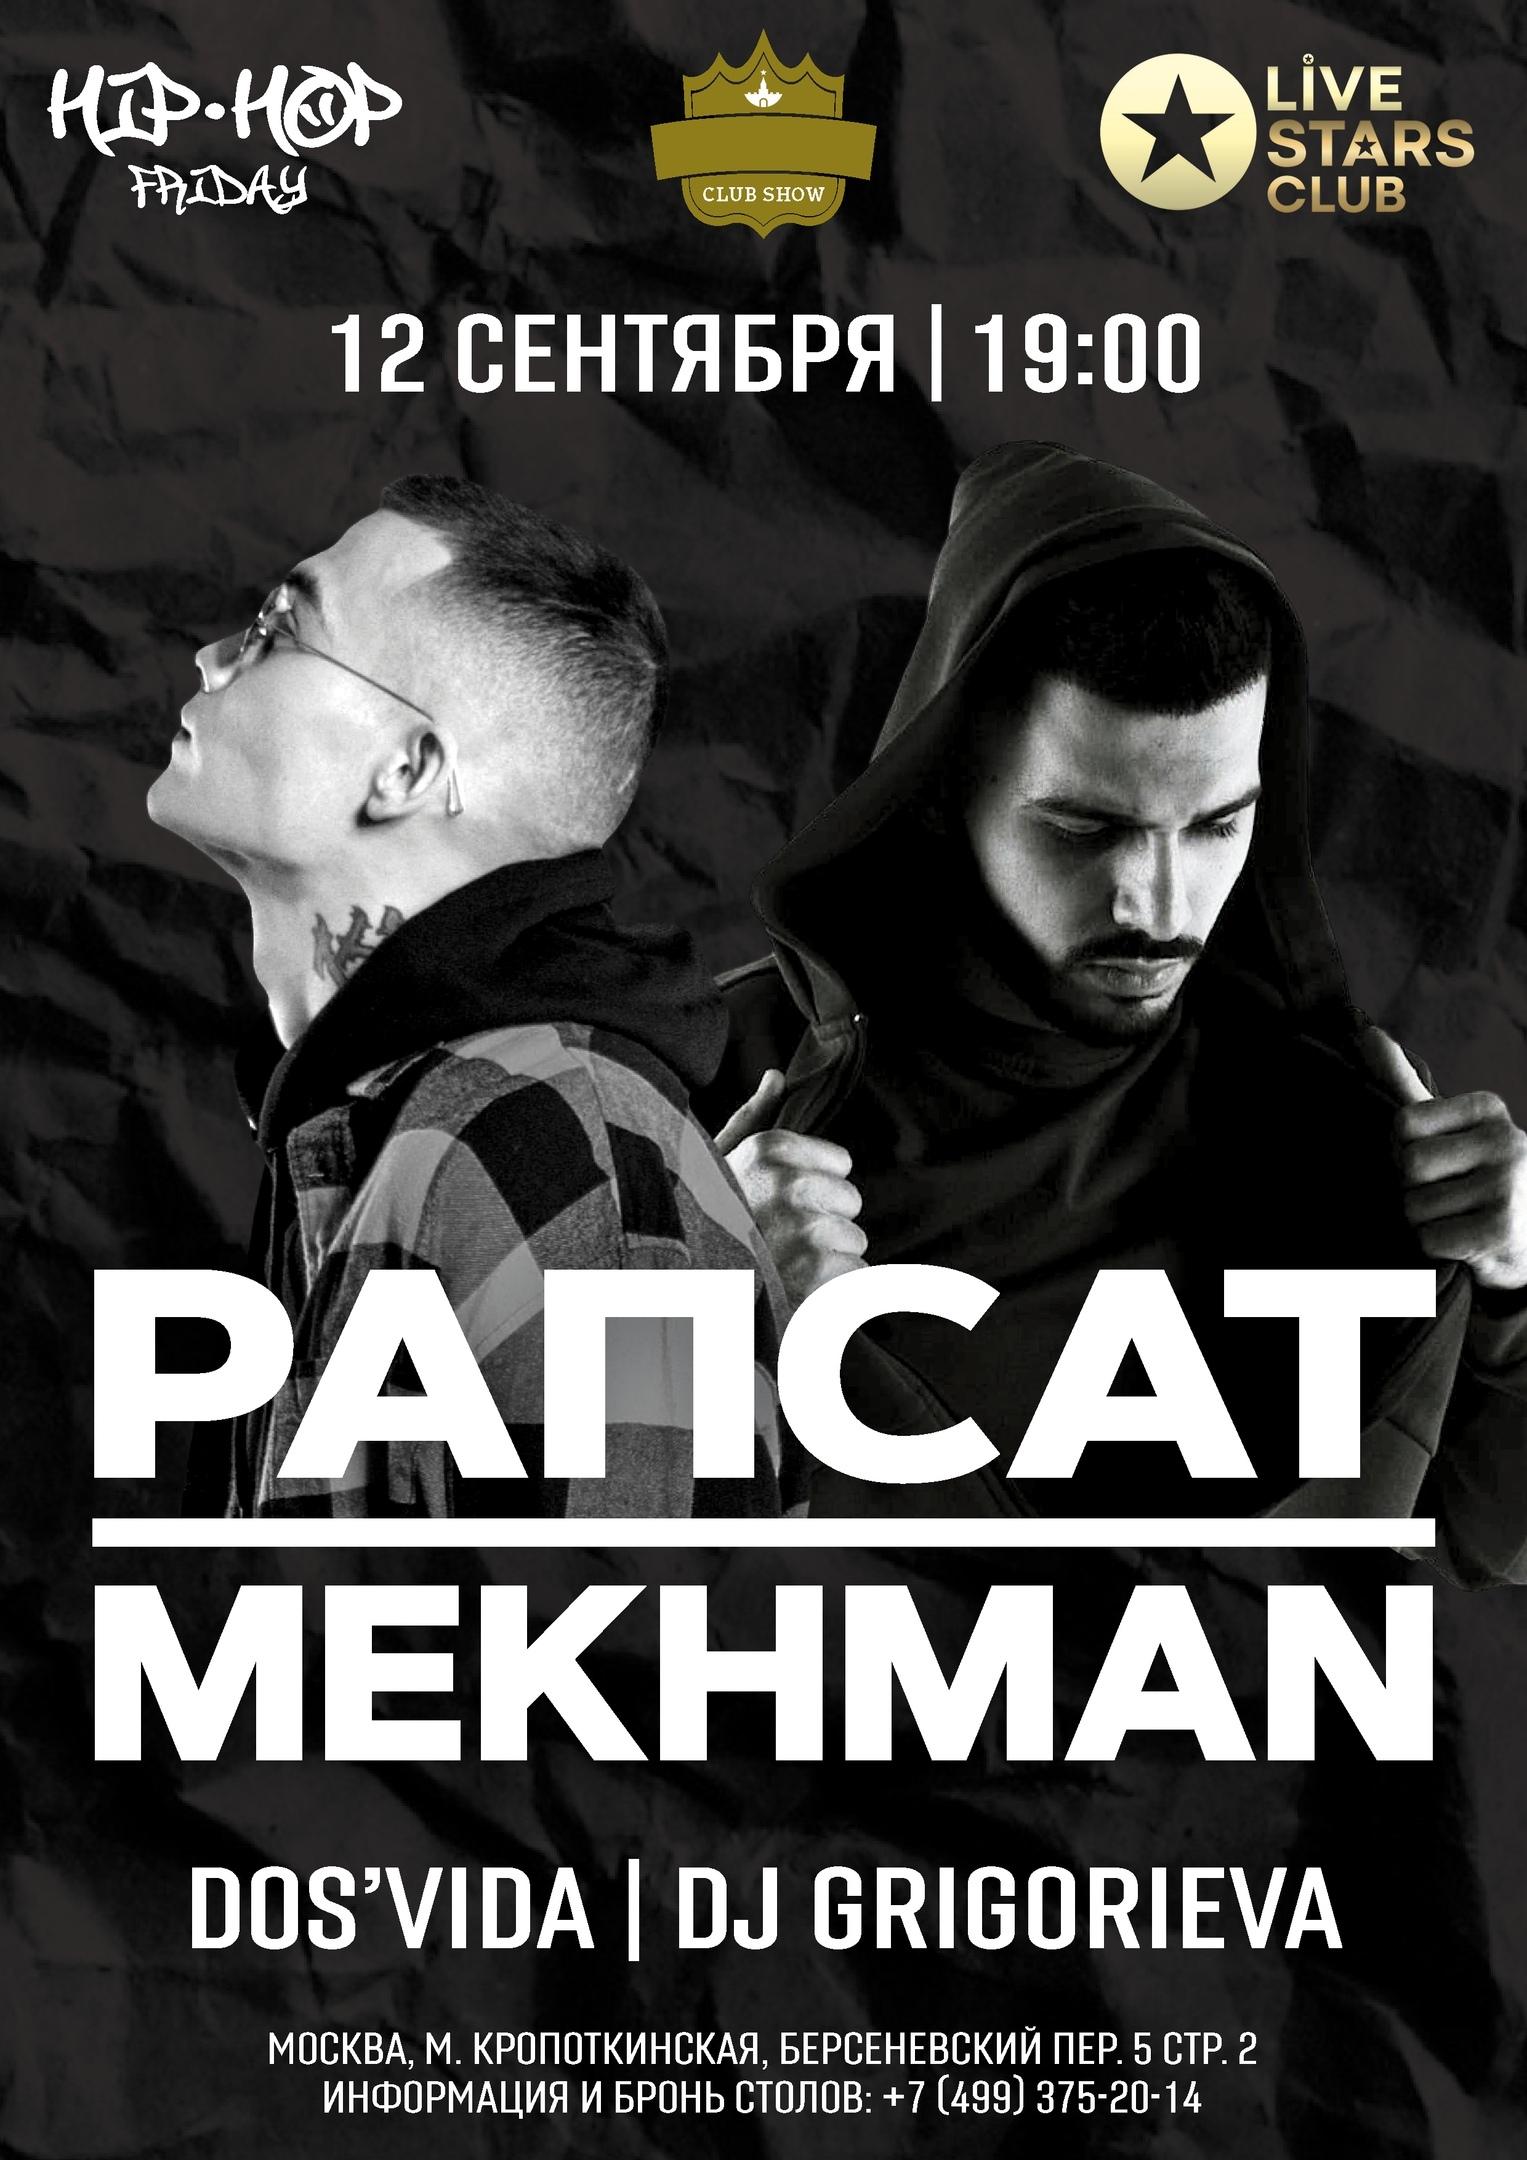 Рапсат | Mekhman